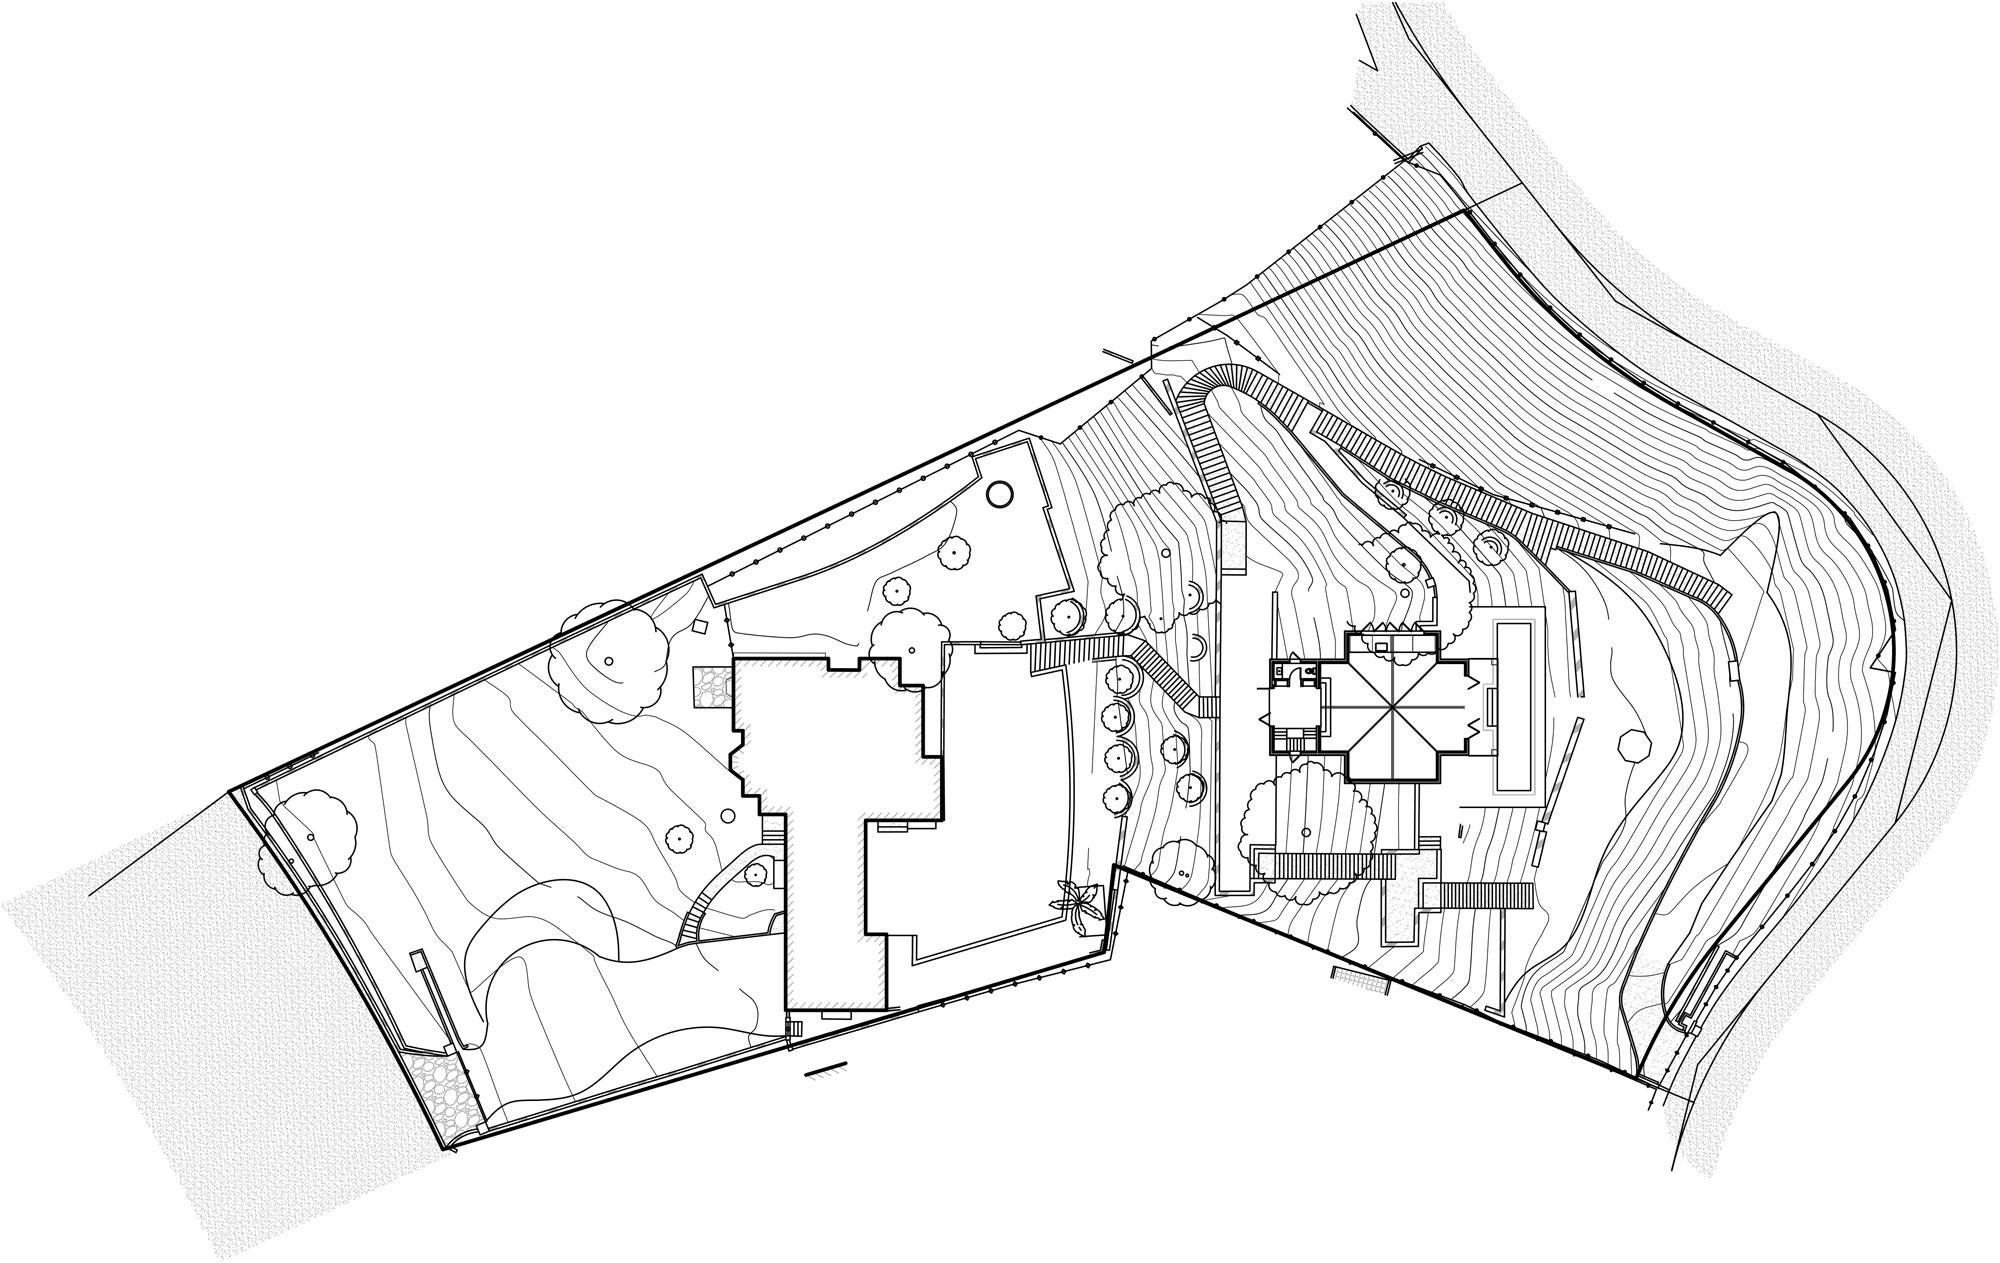 1-HOLLYWOOD-ART-STUDIO-SITE-PLAN.jpg